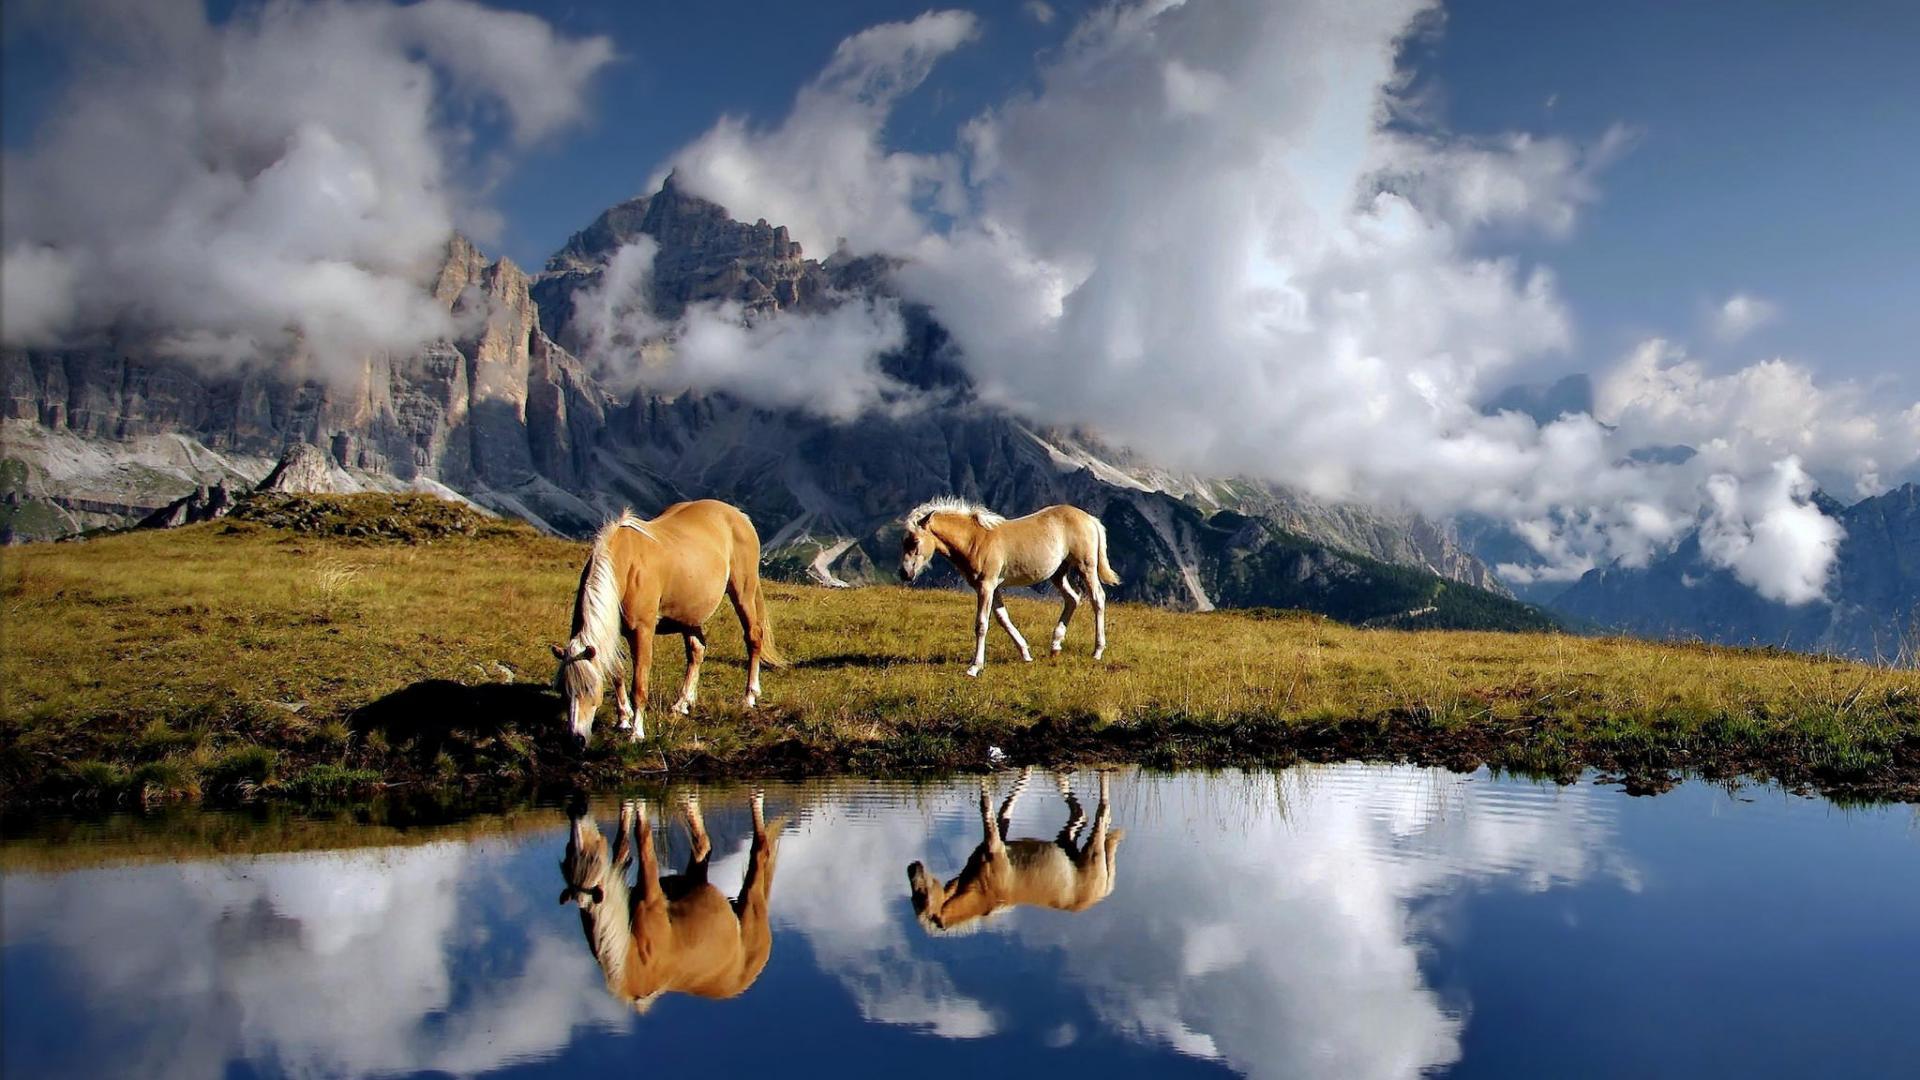 HD Horse Backgrounds Desktop 1920x1080